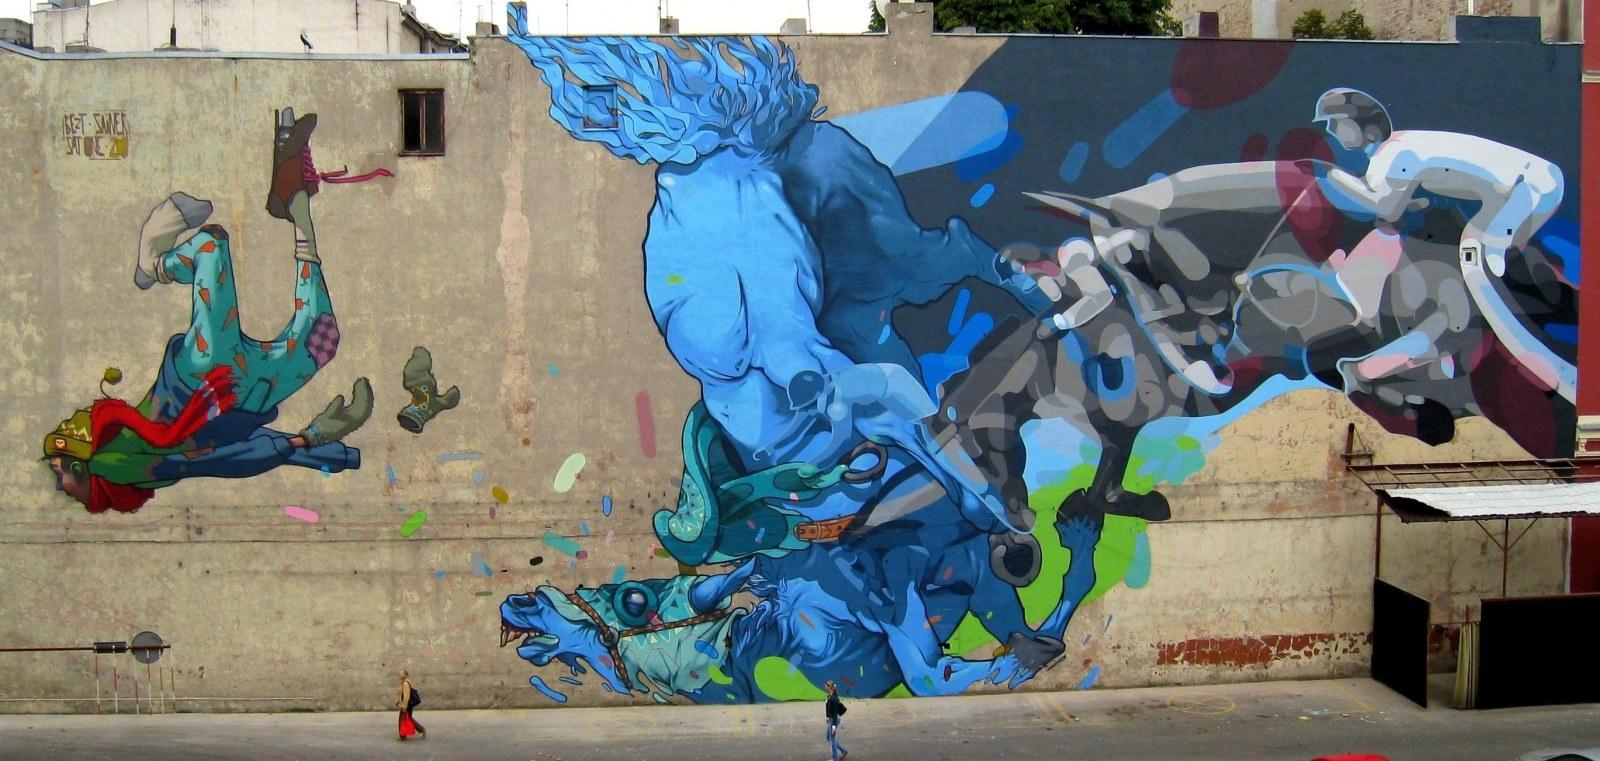 etam-cru-psychedelic-street-art-etam-bang-jpg-1600-900